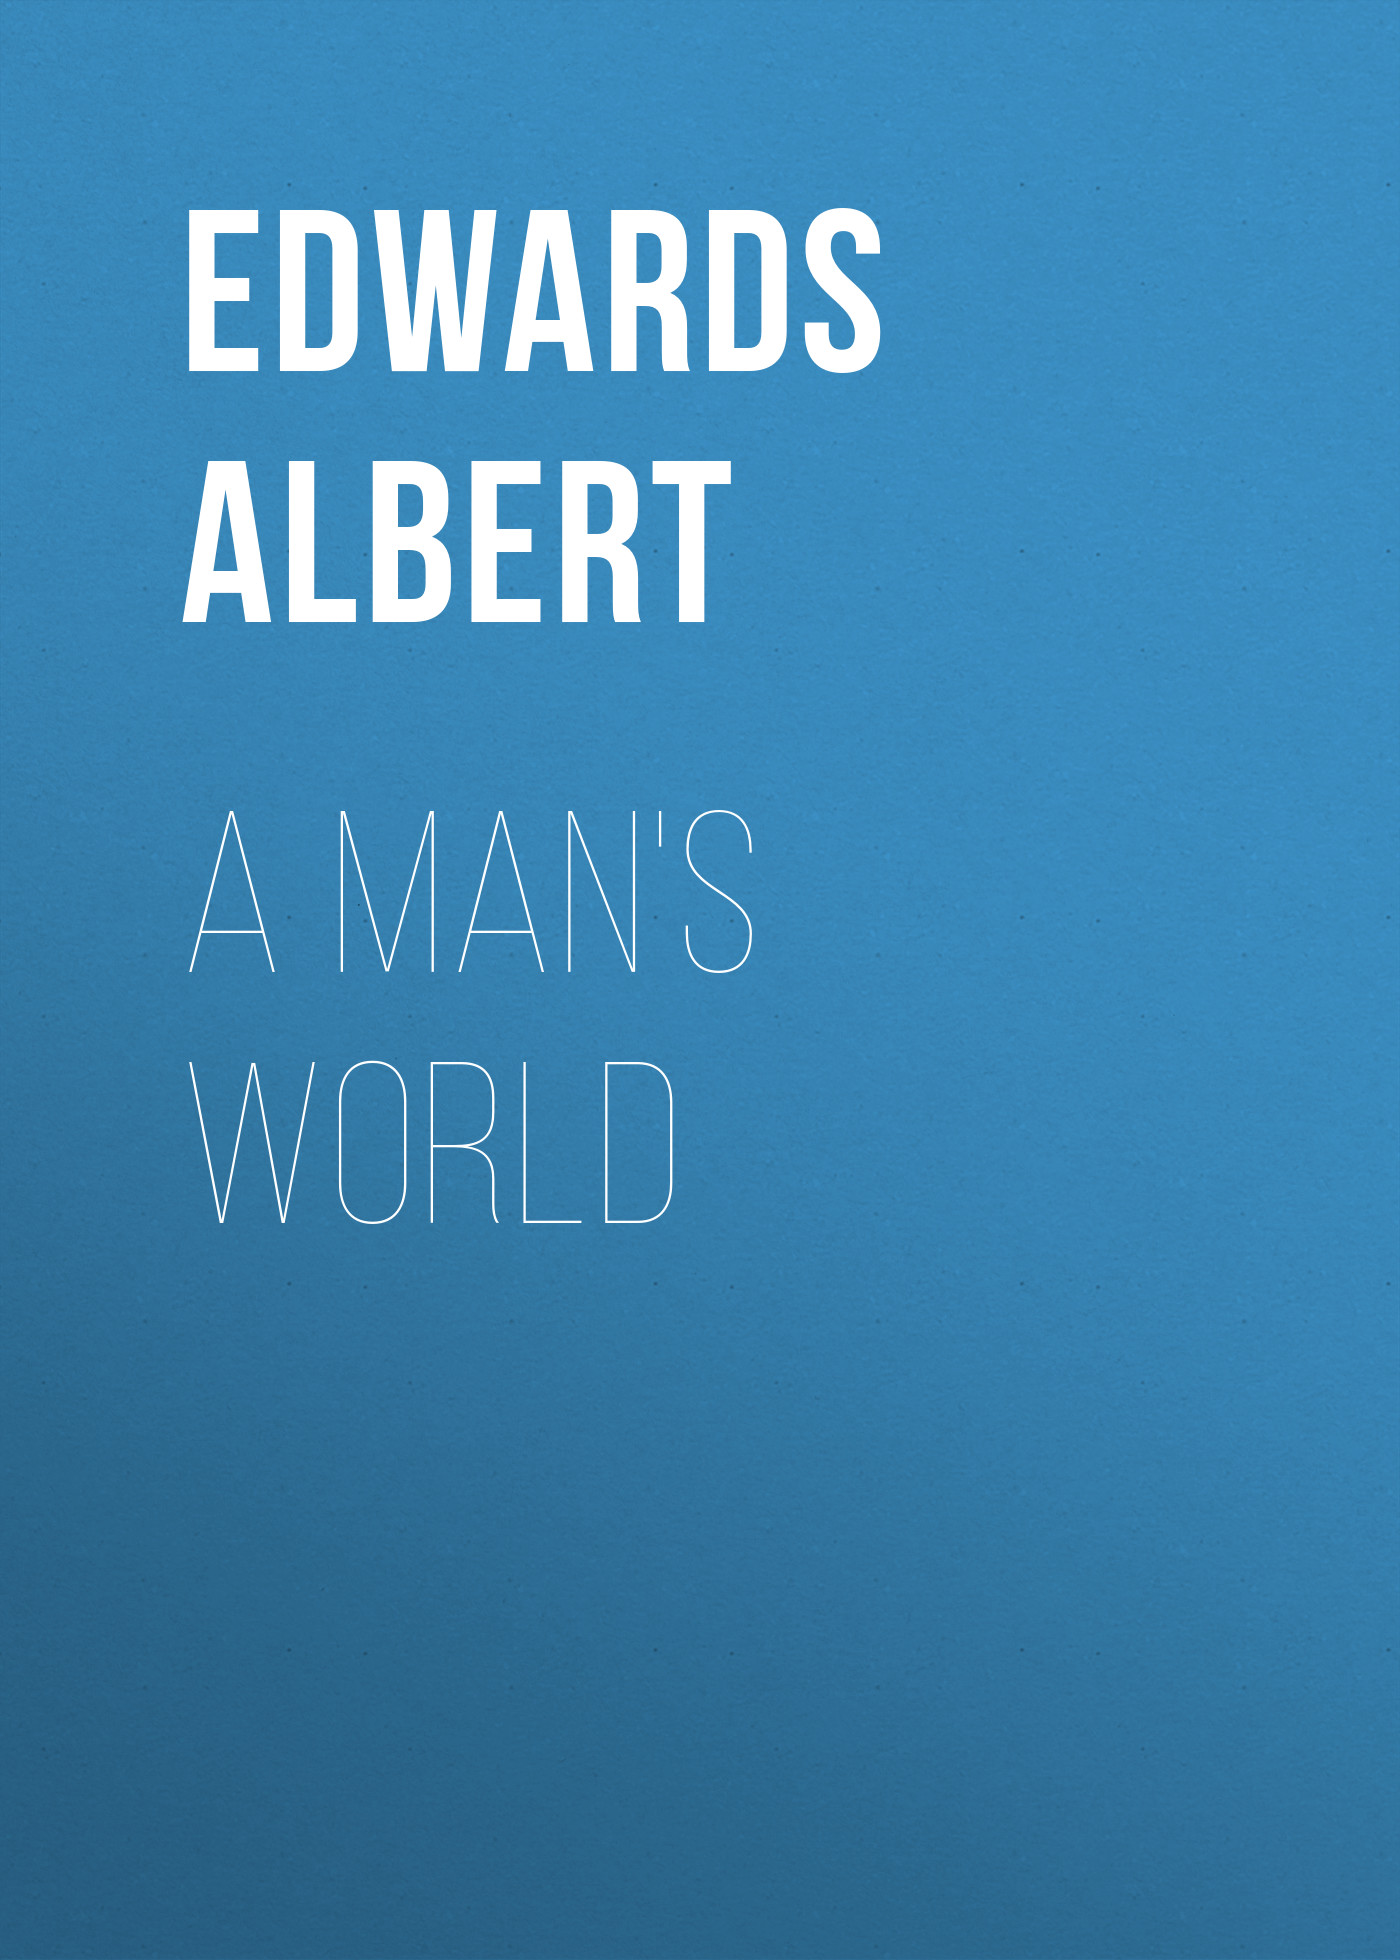 Edwards Albert A Man's World джинсы муж new albert chino gas